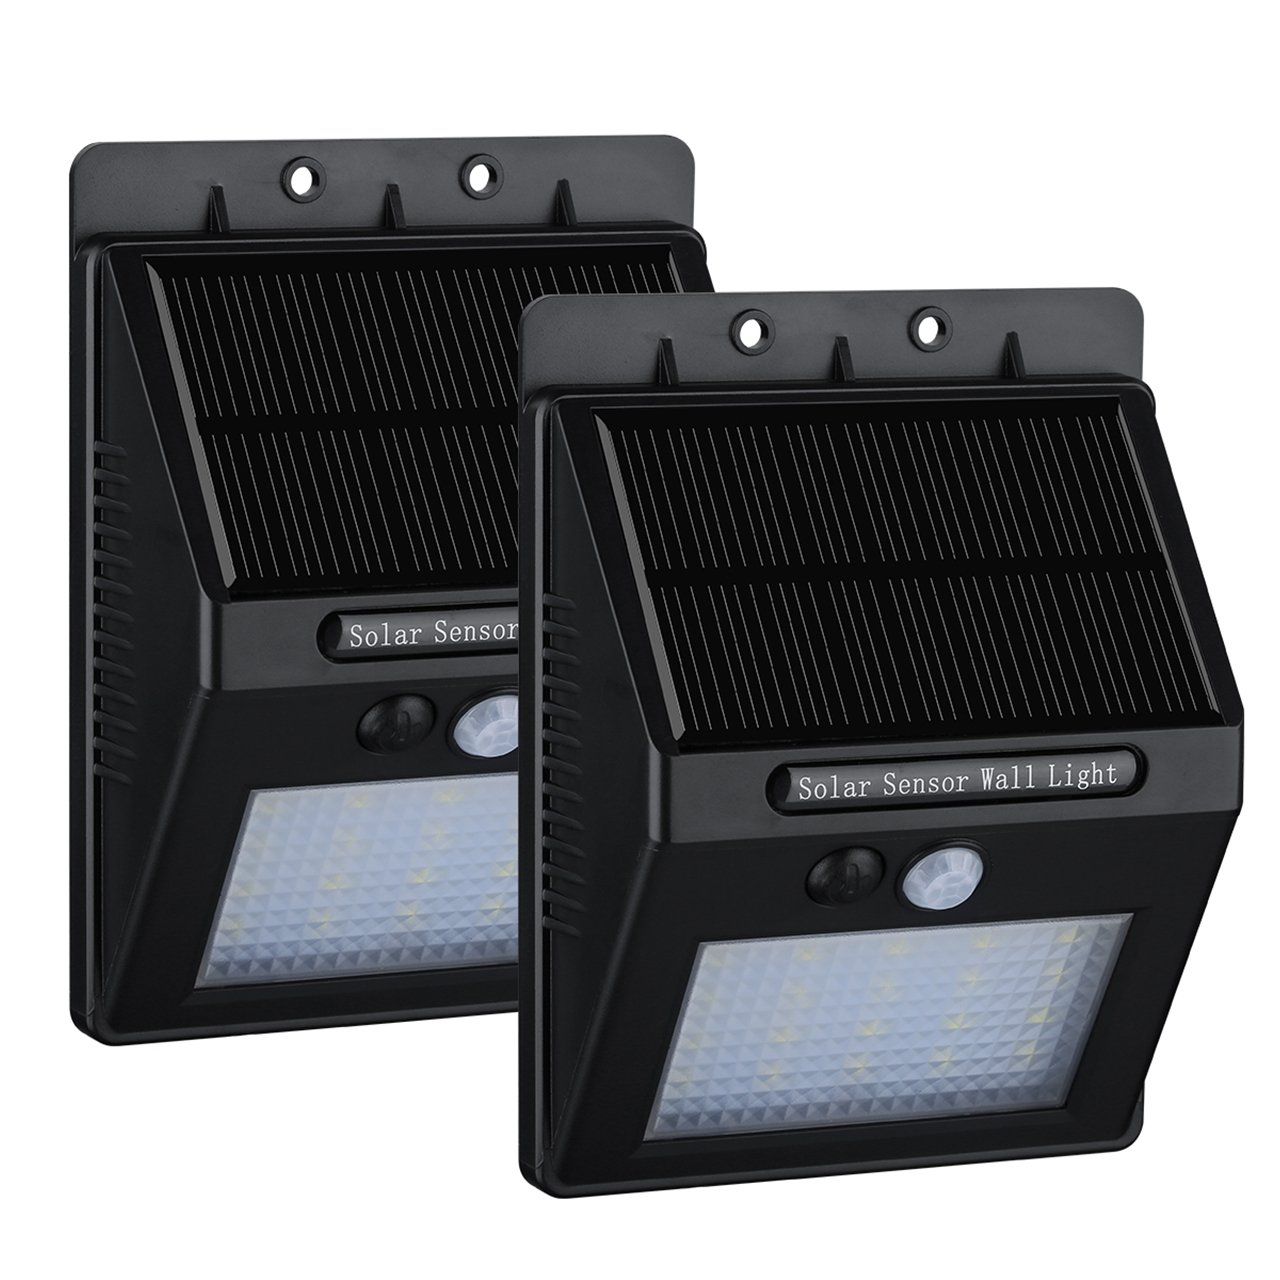 2 Pack 20 LED Solar Motion Sensor Light, Homitt LED Outdoor Security Sensor Light For Garden, Pathway, Deck Stair, 400 Lumens Super Bright, Waterproof, Intelligent Two Sensing Modes